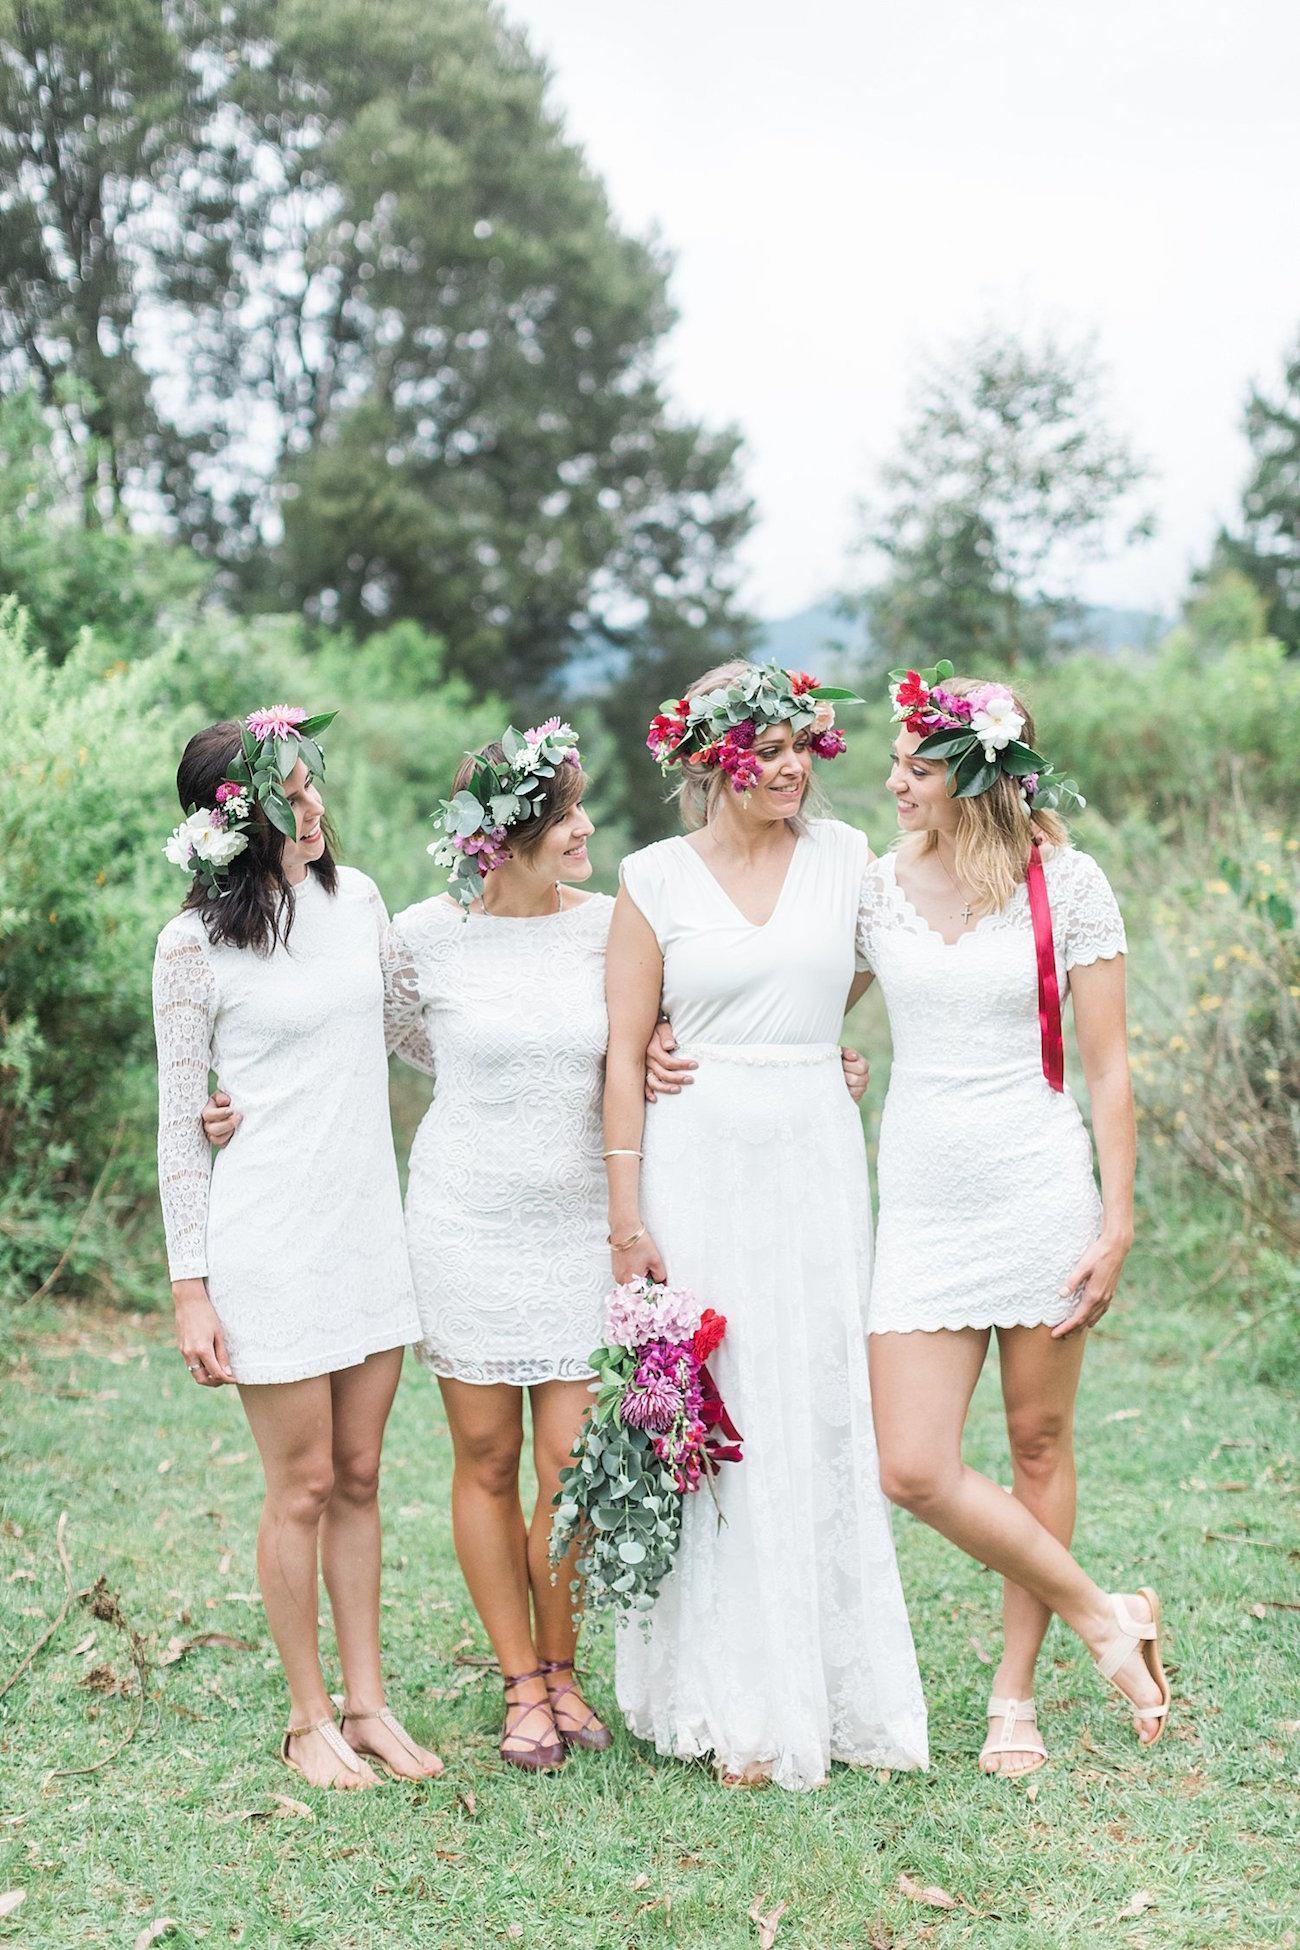 Bridesmaids in White Lace | Image: Alicia Landman